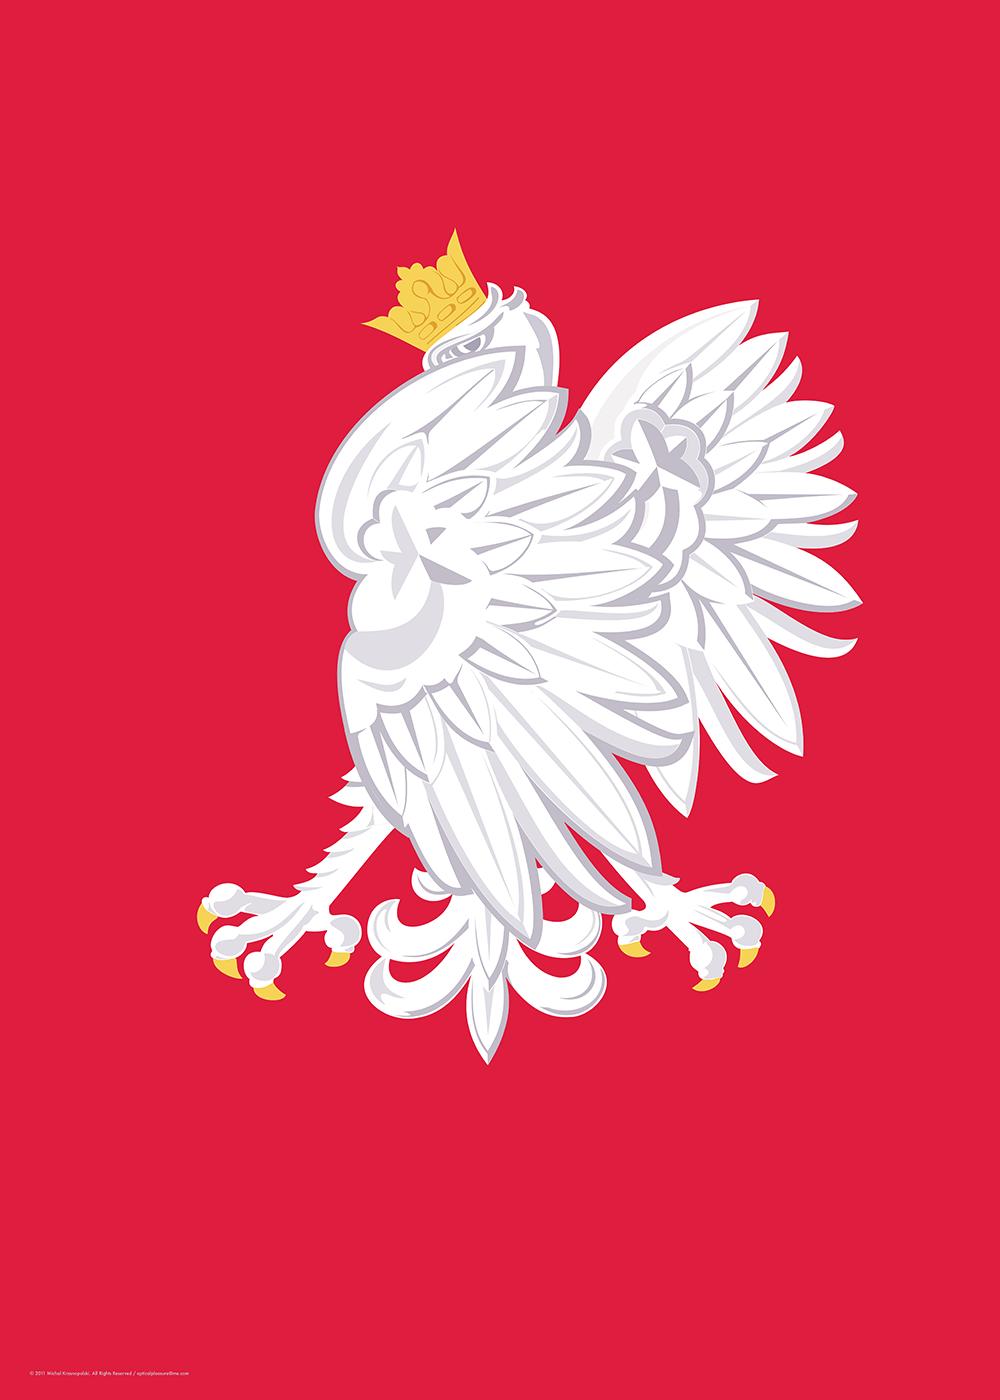 krasnopolski_eagle.png